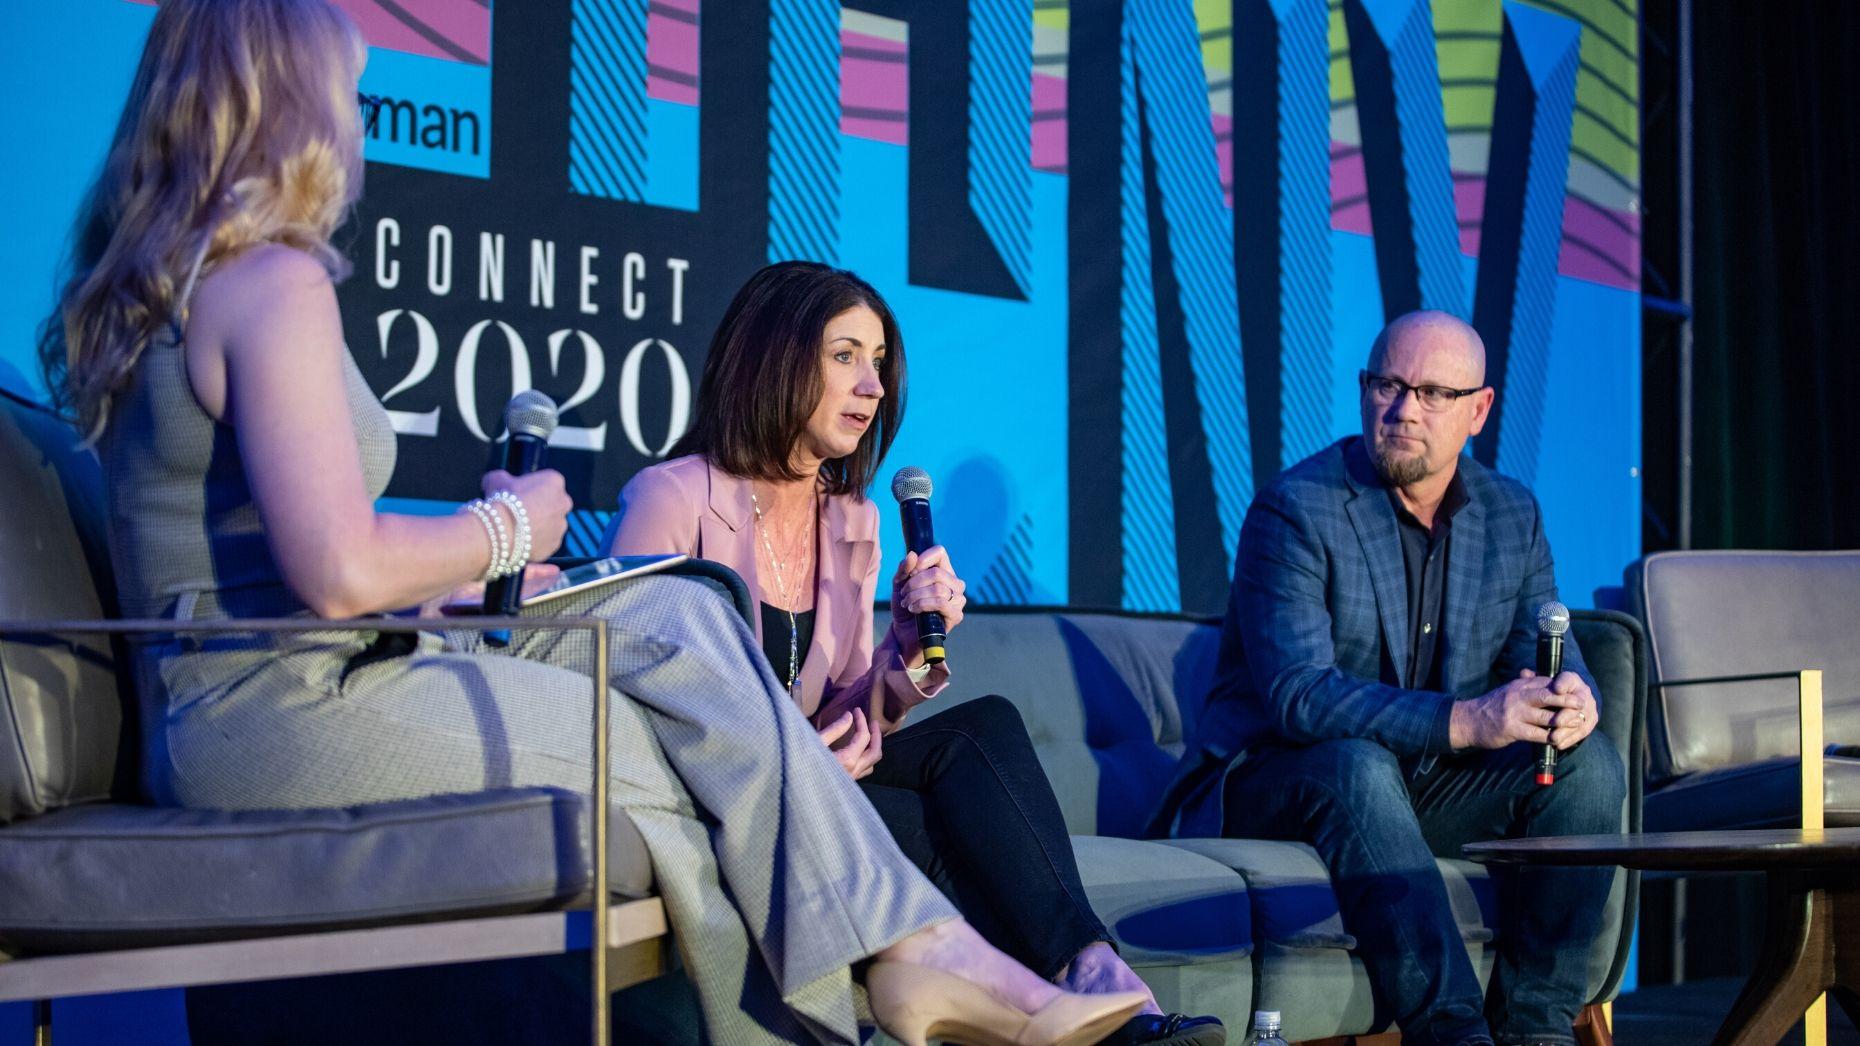 WATCH: Startups that use big data